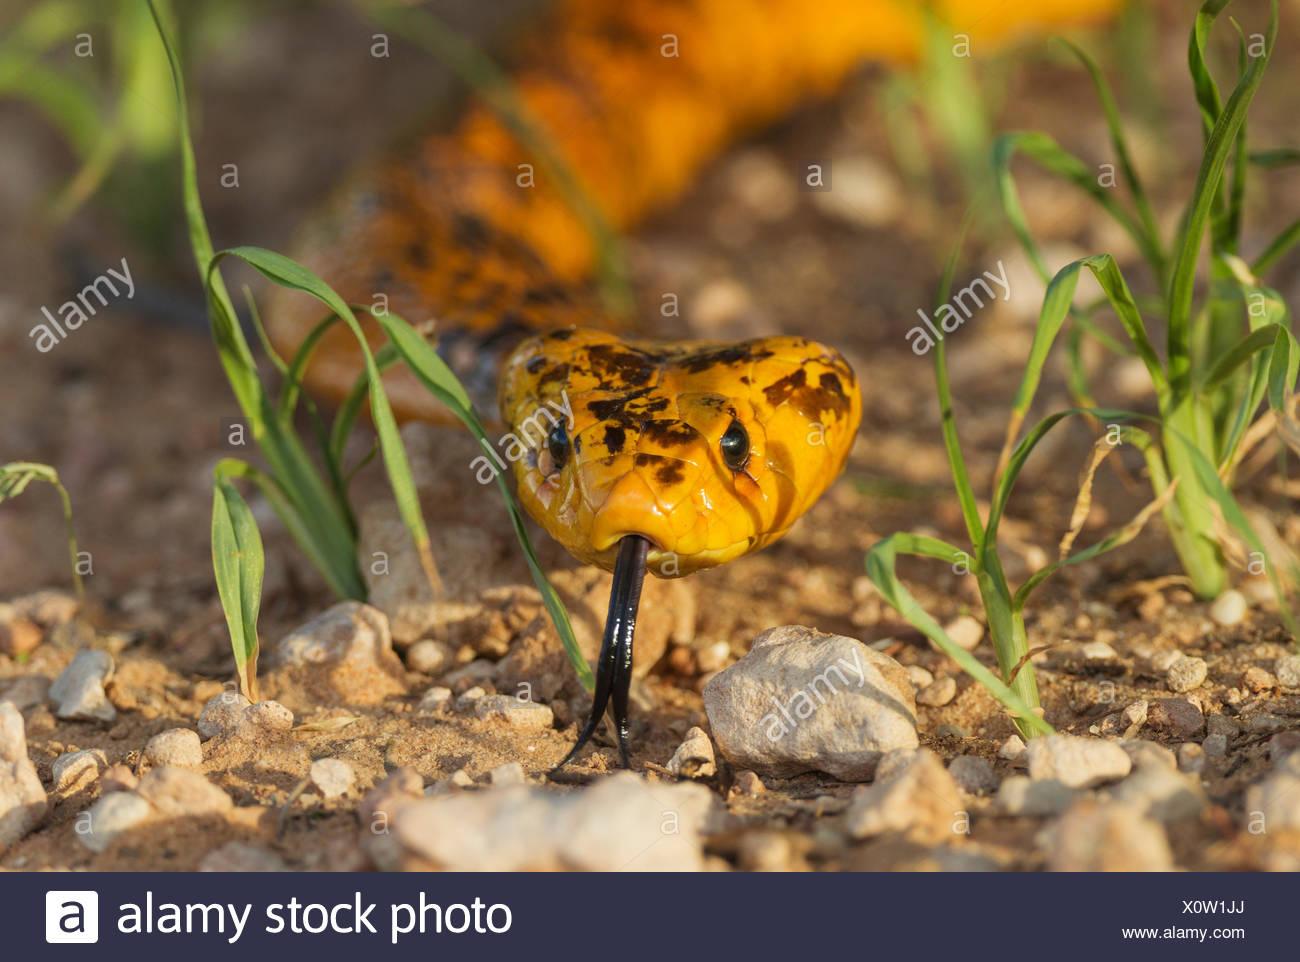 Cape Cobra (Naja nivea), sticking out tongue, during the rainy season in green grass, Kalahari Desert - Stock Image